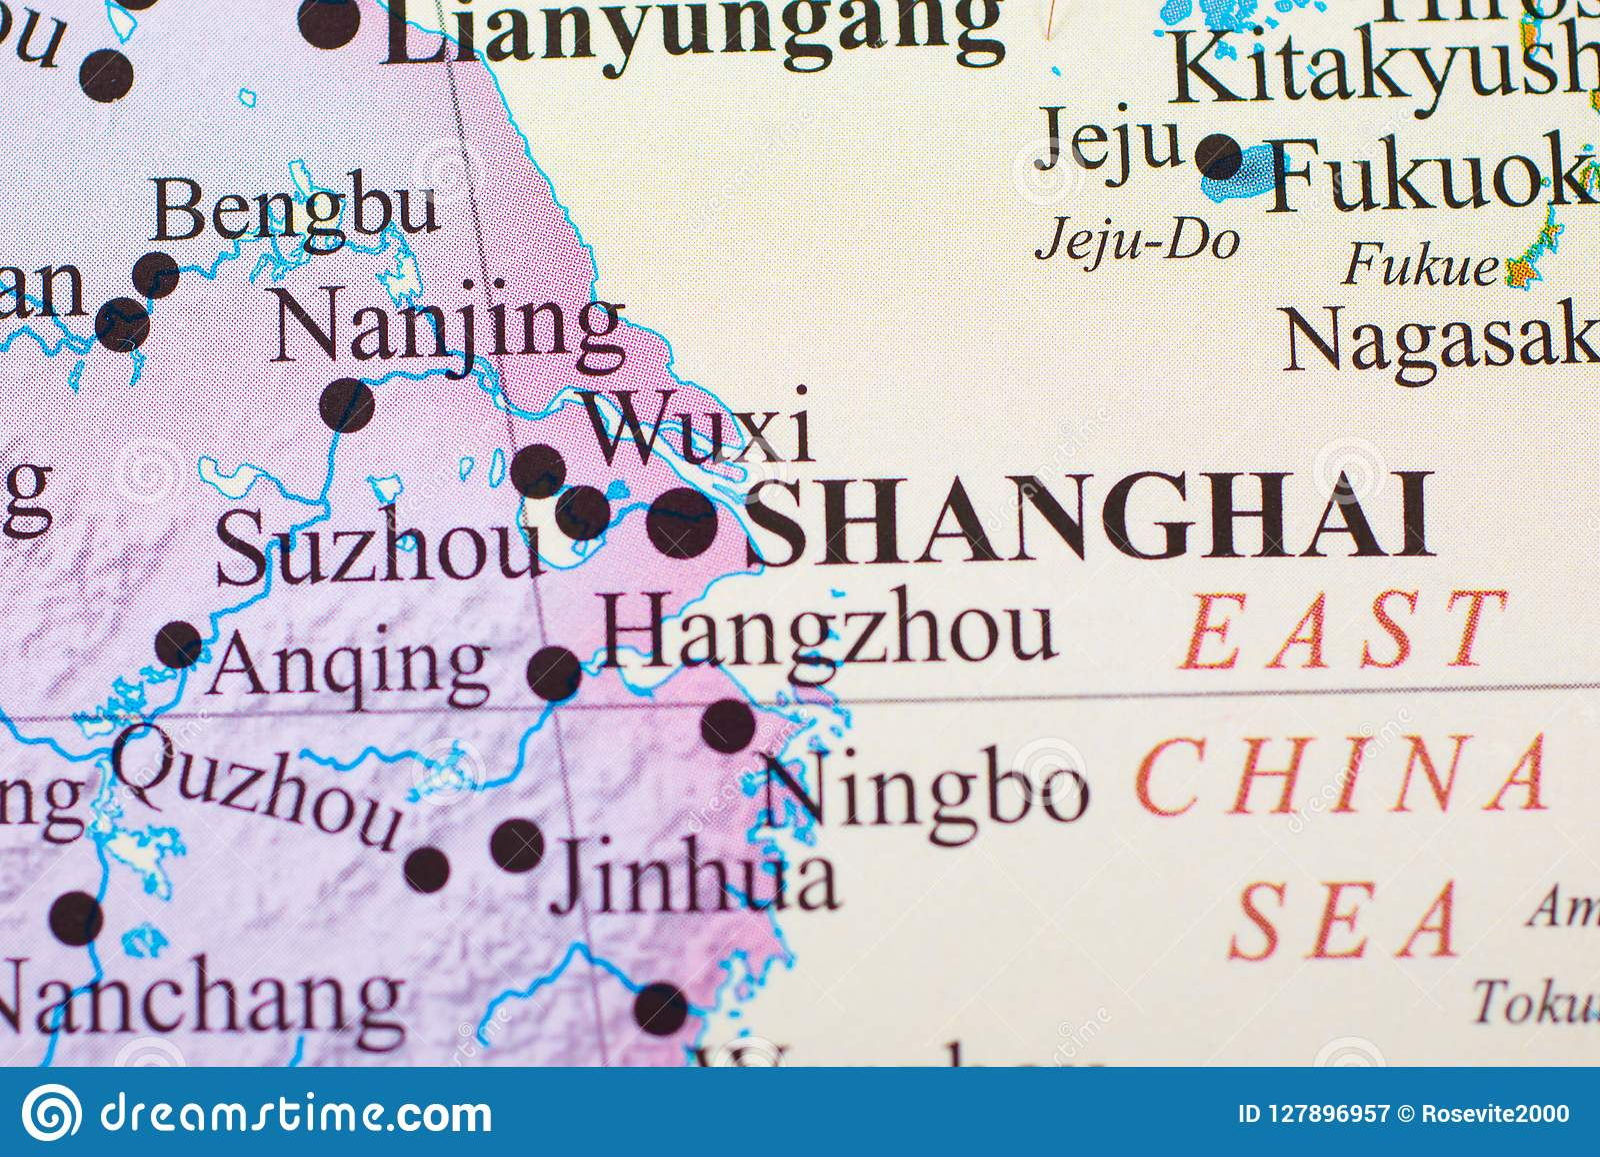 Map Focus On Shanghai China Stock Image - Image of ... on xinjiang china map, guangdong china map, dalian china map, manchuria map, seoul map, yantai china map, shanghai on map, jakarta map, xingang china map, japan map, china city map, delhi india map, east china map, wuxi china map, east asia map, nanning china map, nanchang china map, nanjing china map, calcutta map, jiangsu province china map,